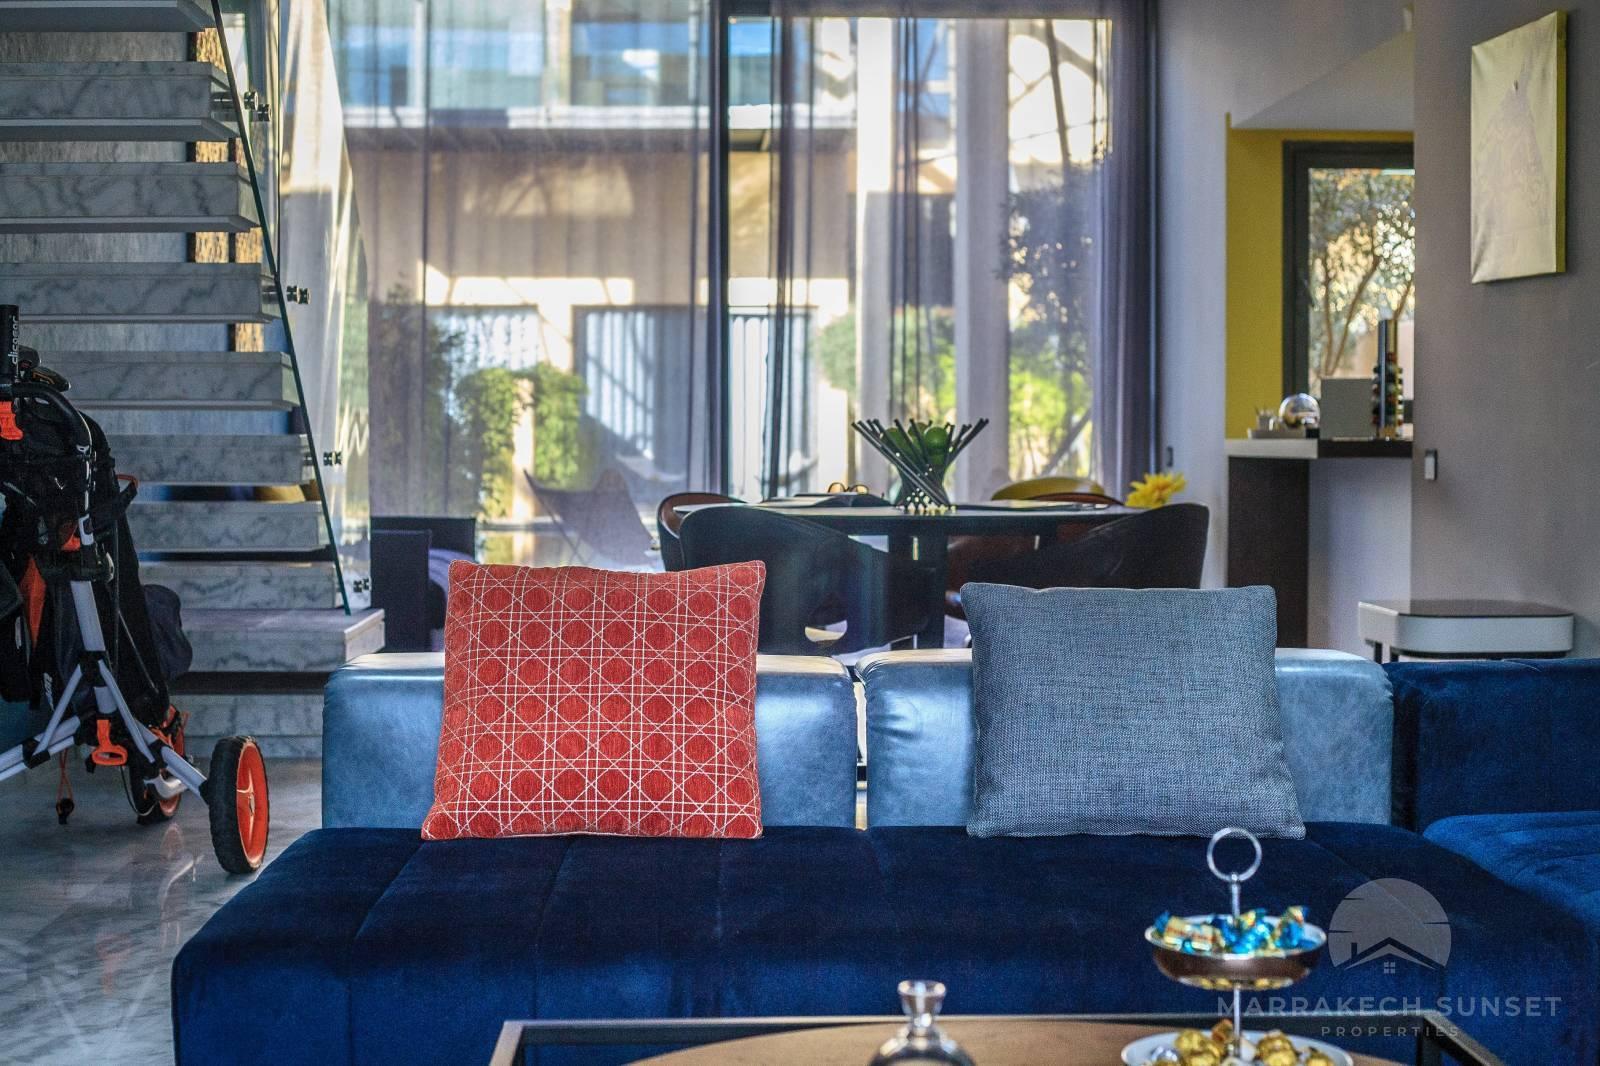 Luxury 1 bedroom Loft apartment for sale in Marrakech